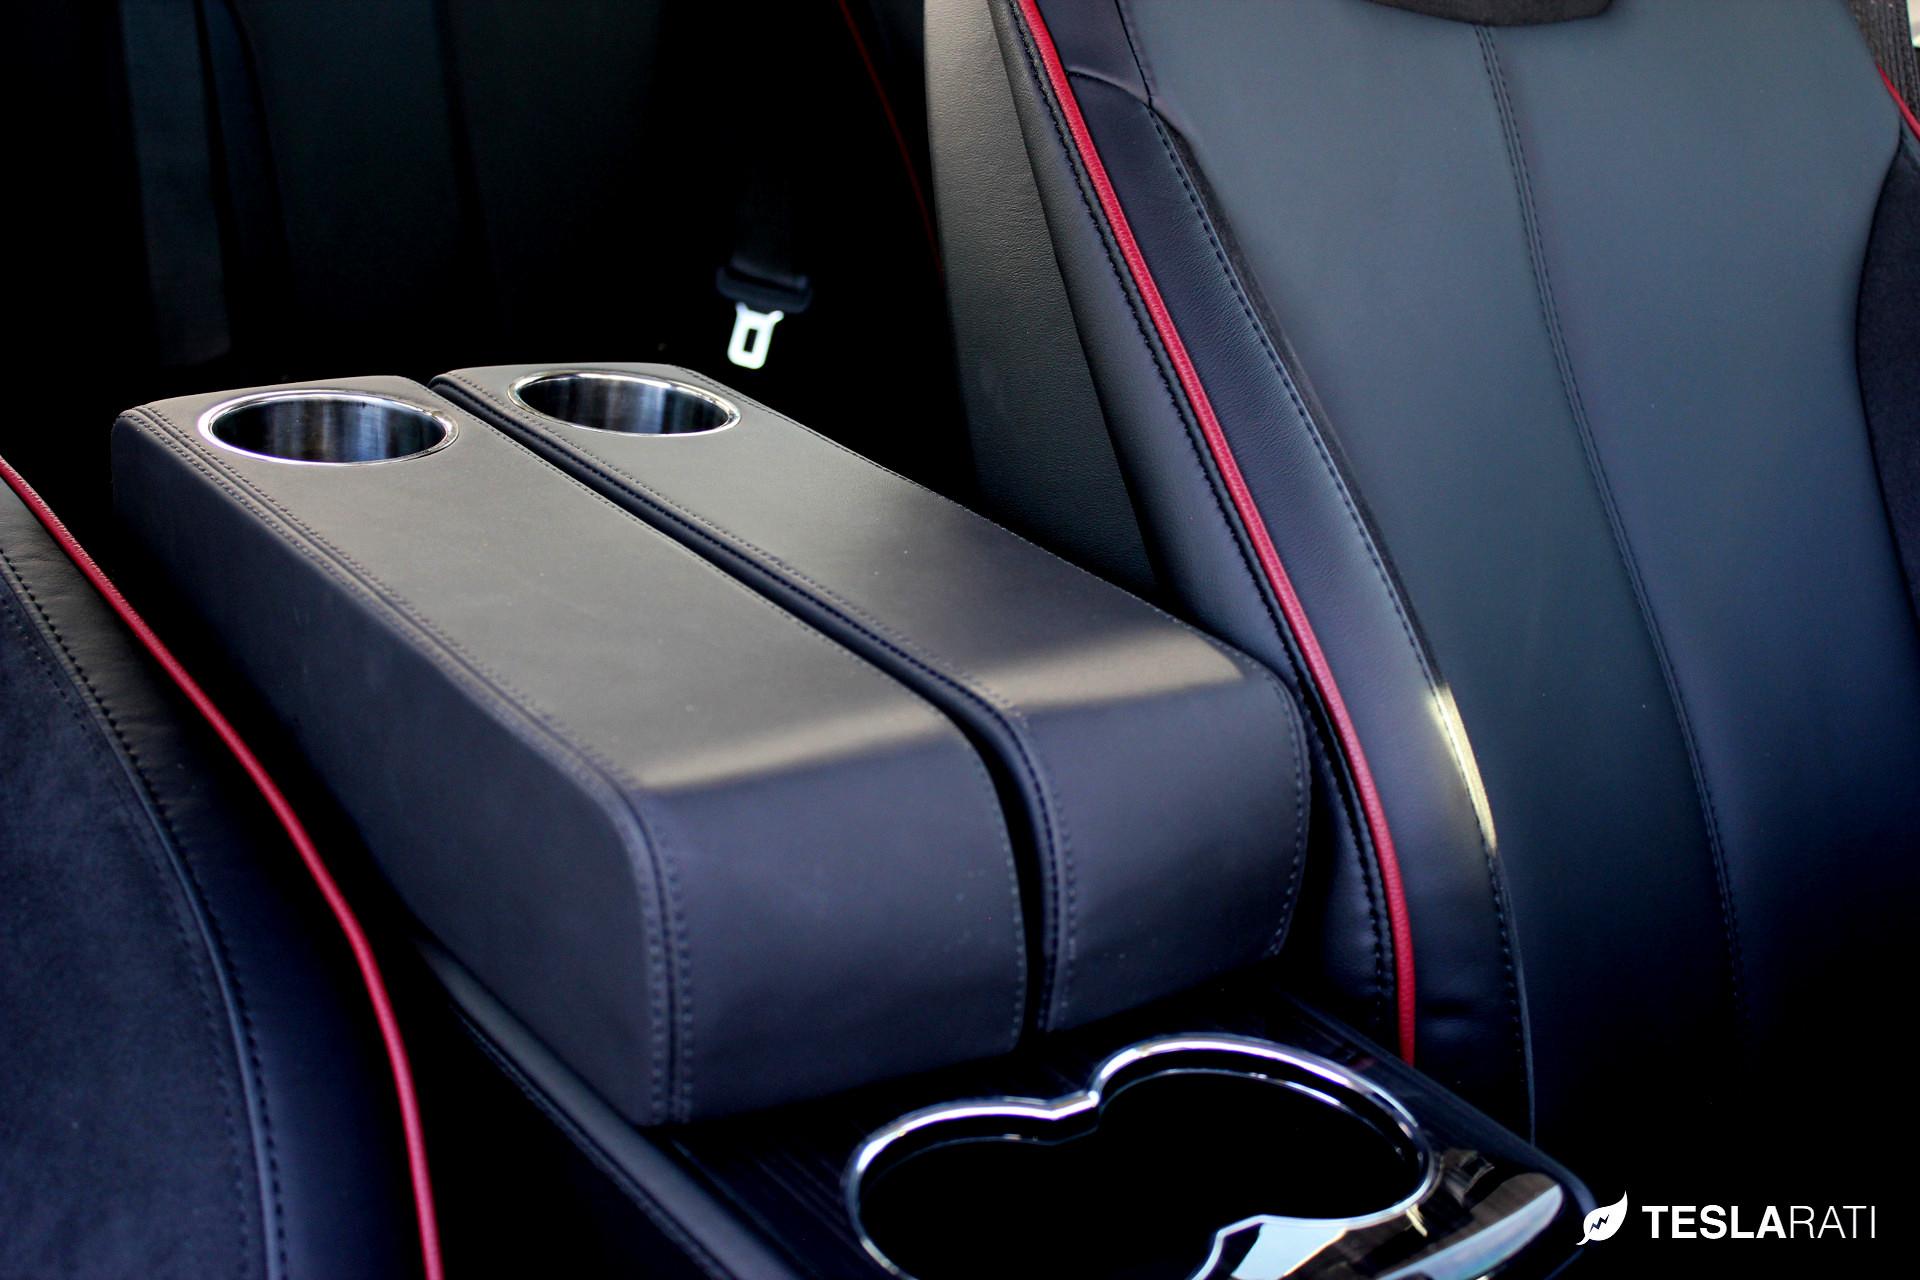 PARZ_Tesla_Rear_Seat_Cup_Holders_4